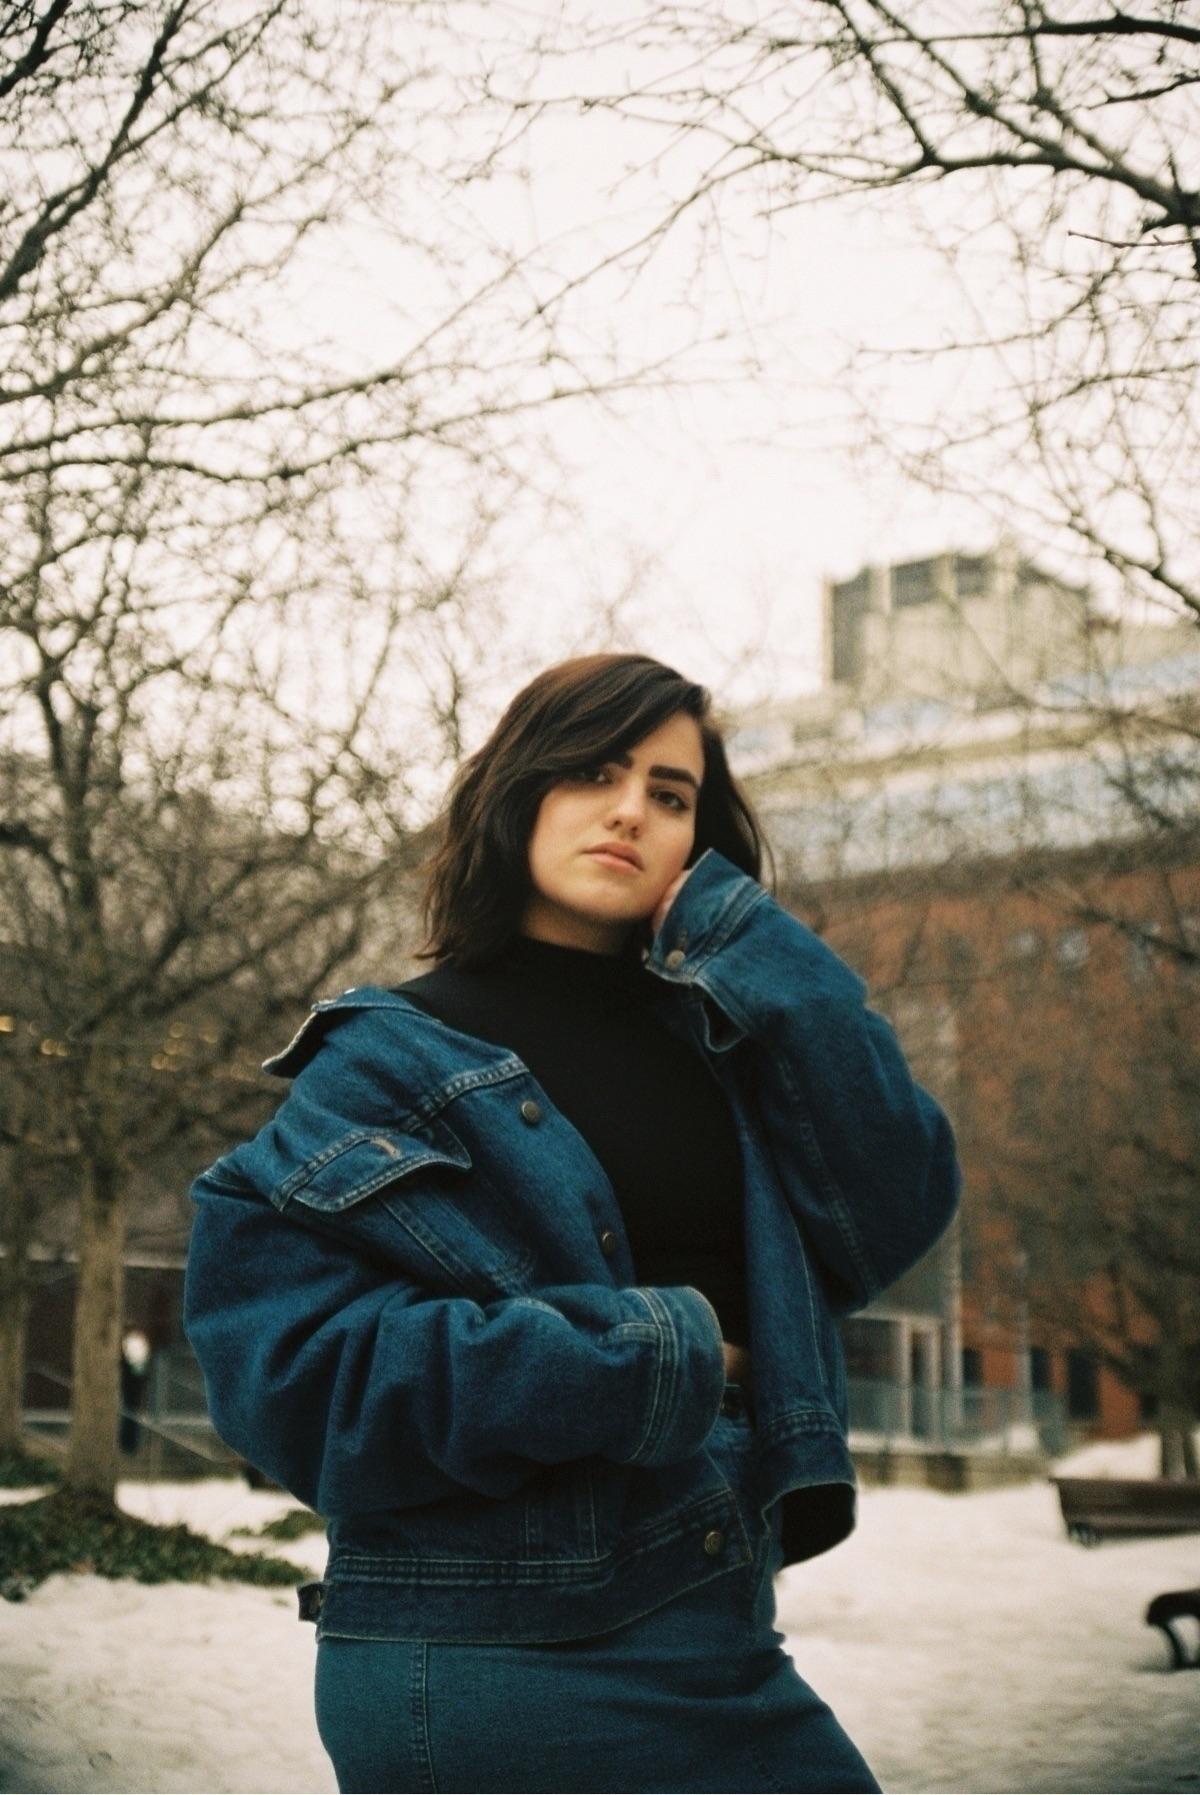 Softness - 35mm, portra400, portrait - melinalovexo | ello